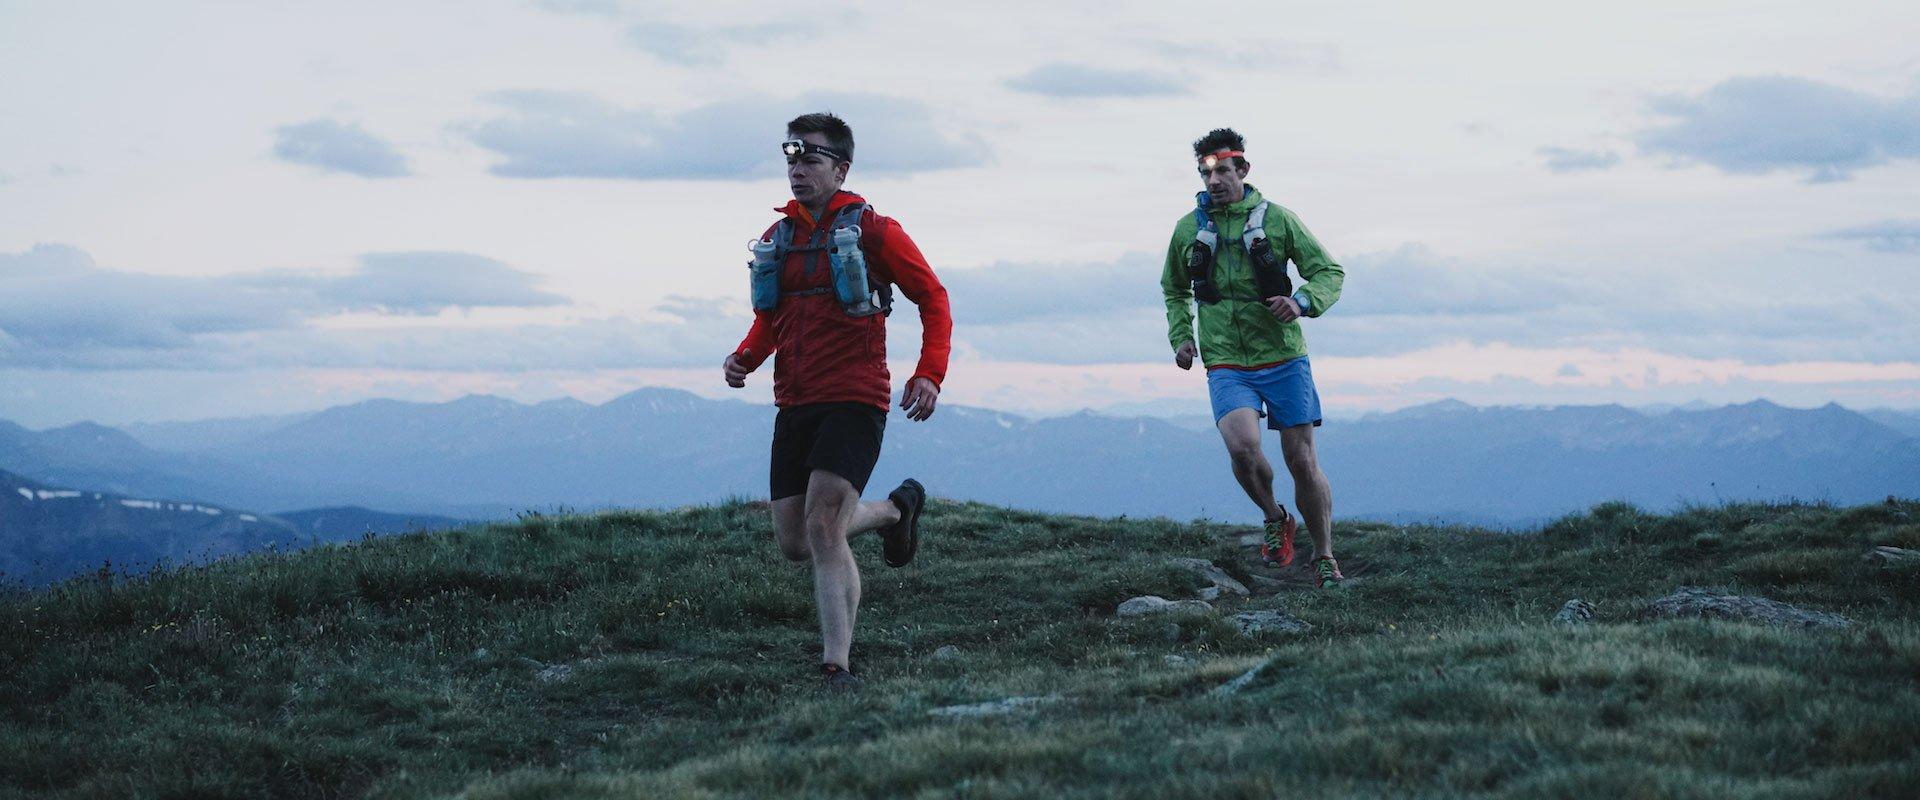 vimff 2019 trail running night title bg